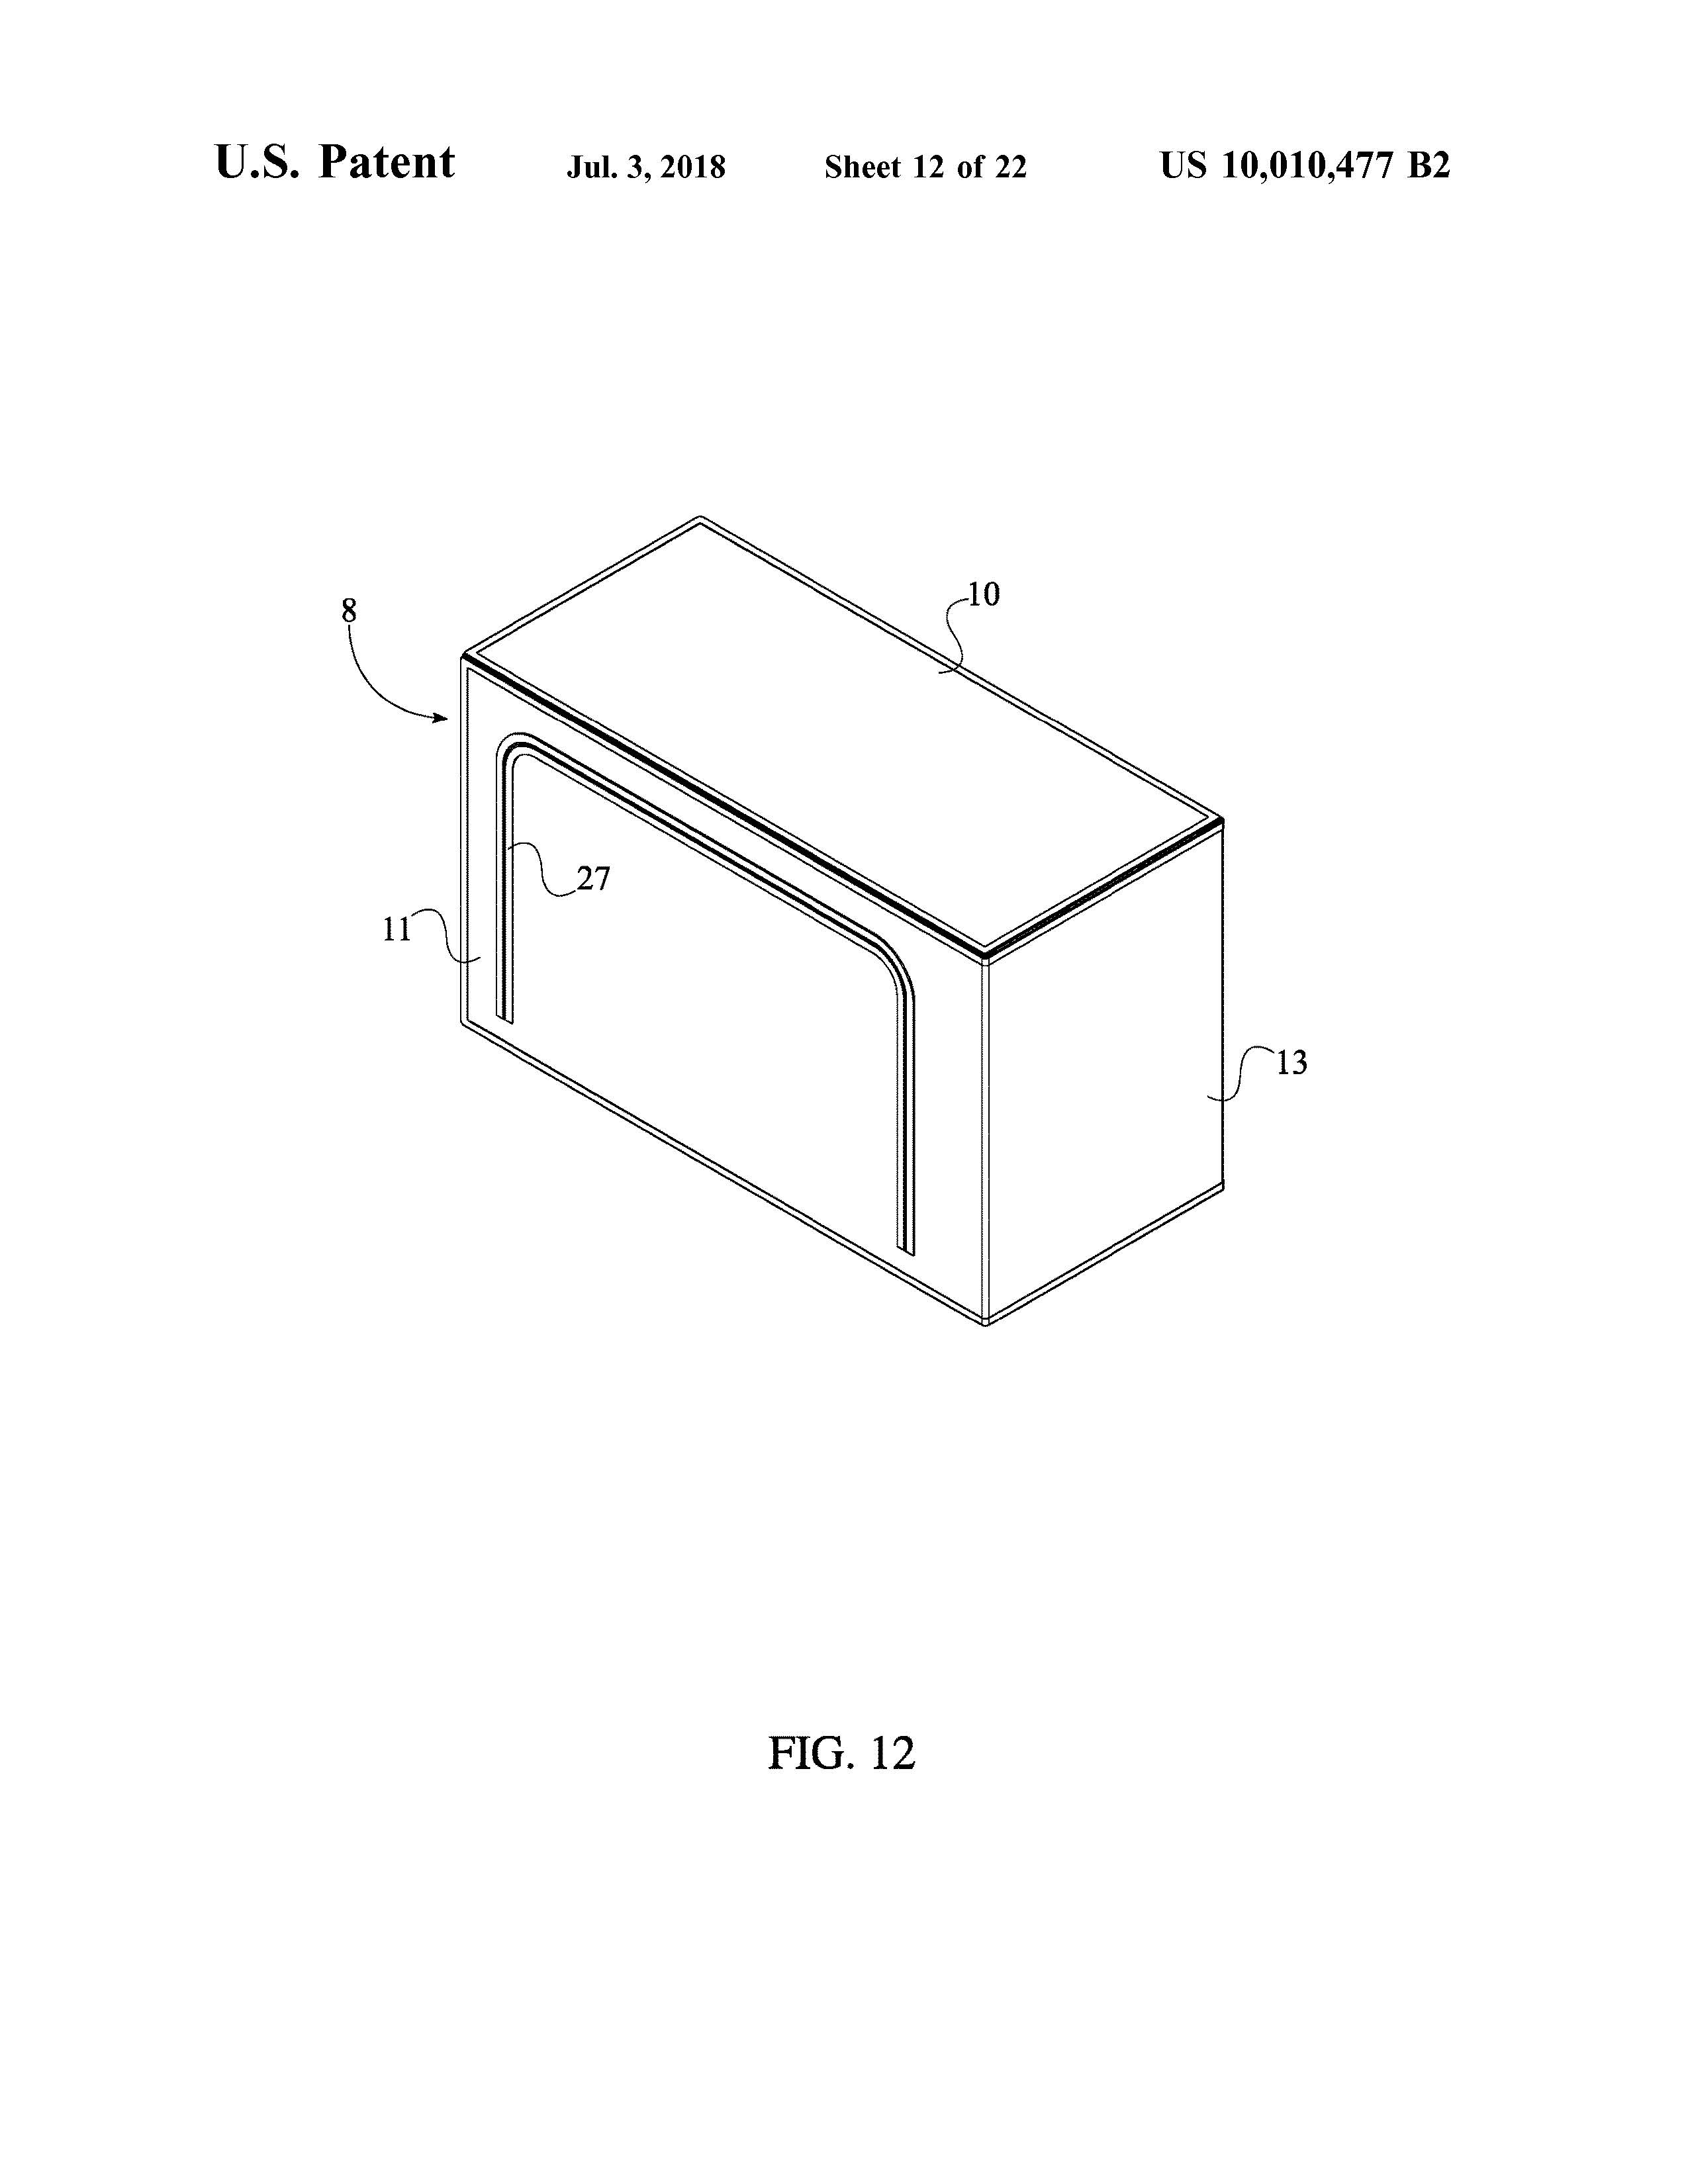 Sauna Tent Patent Page 14